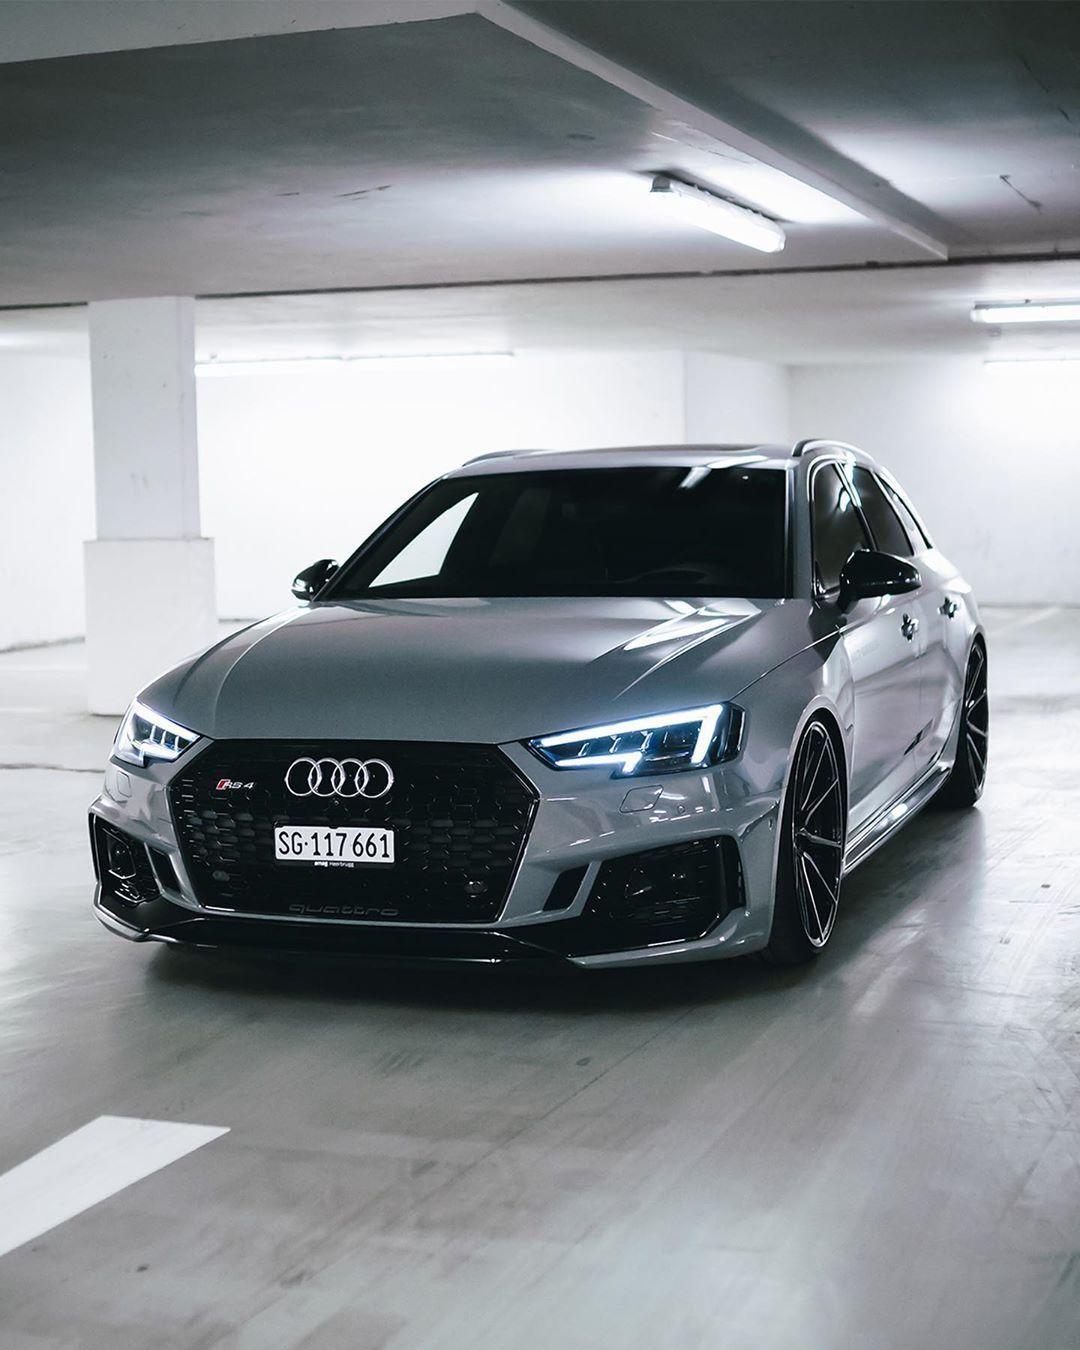 Vossen Wheels On Instagram B9 Audi Rs4 On Hf 3 By Rm Autopflege Oli Stancekult B9r Em 2020 Carros De Luxo Carros Auto